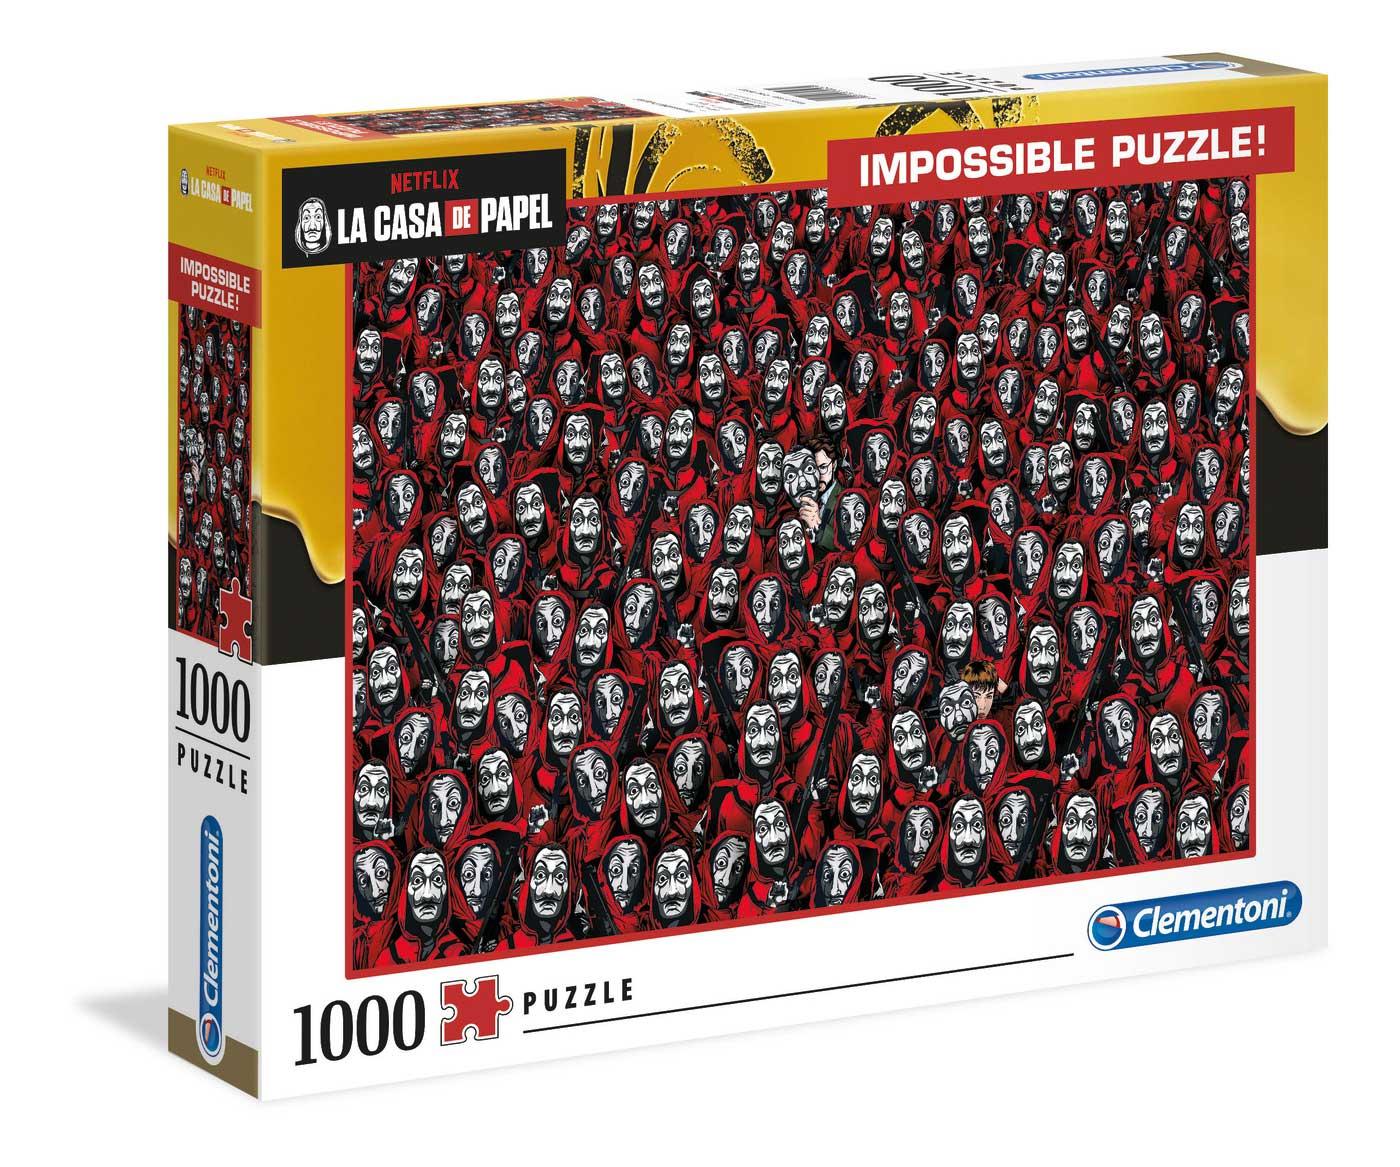 Puzzle Clementoni Imposible La Casa De Papel de 1000 Piezas